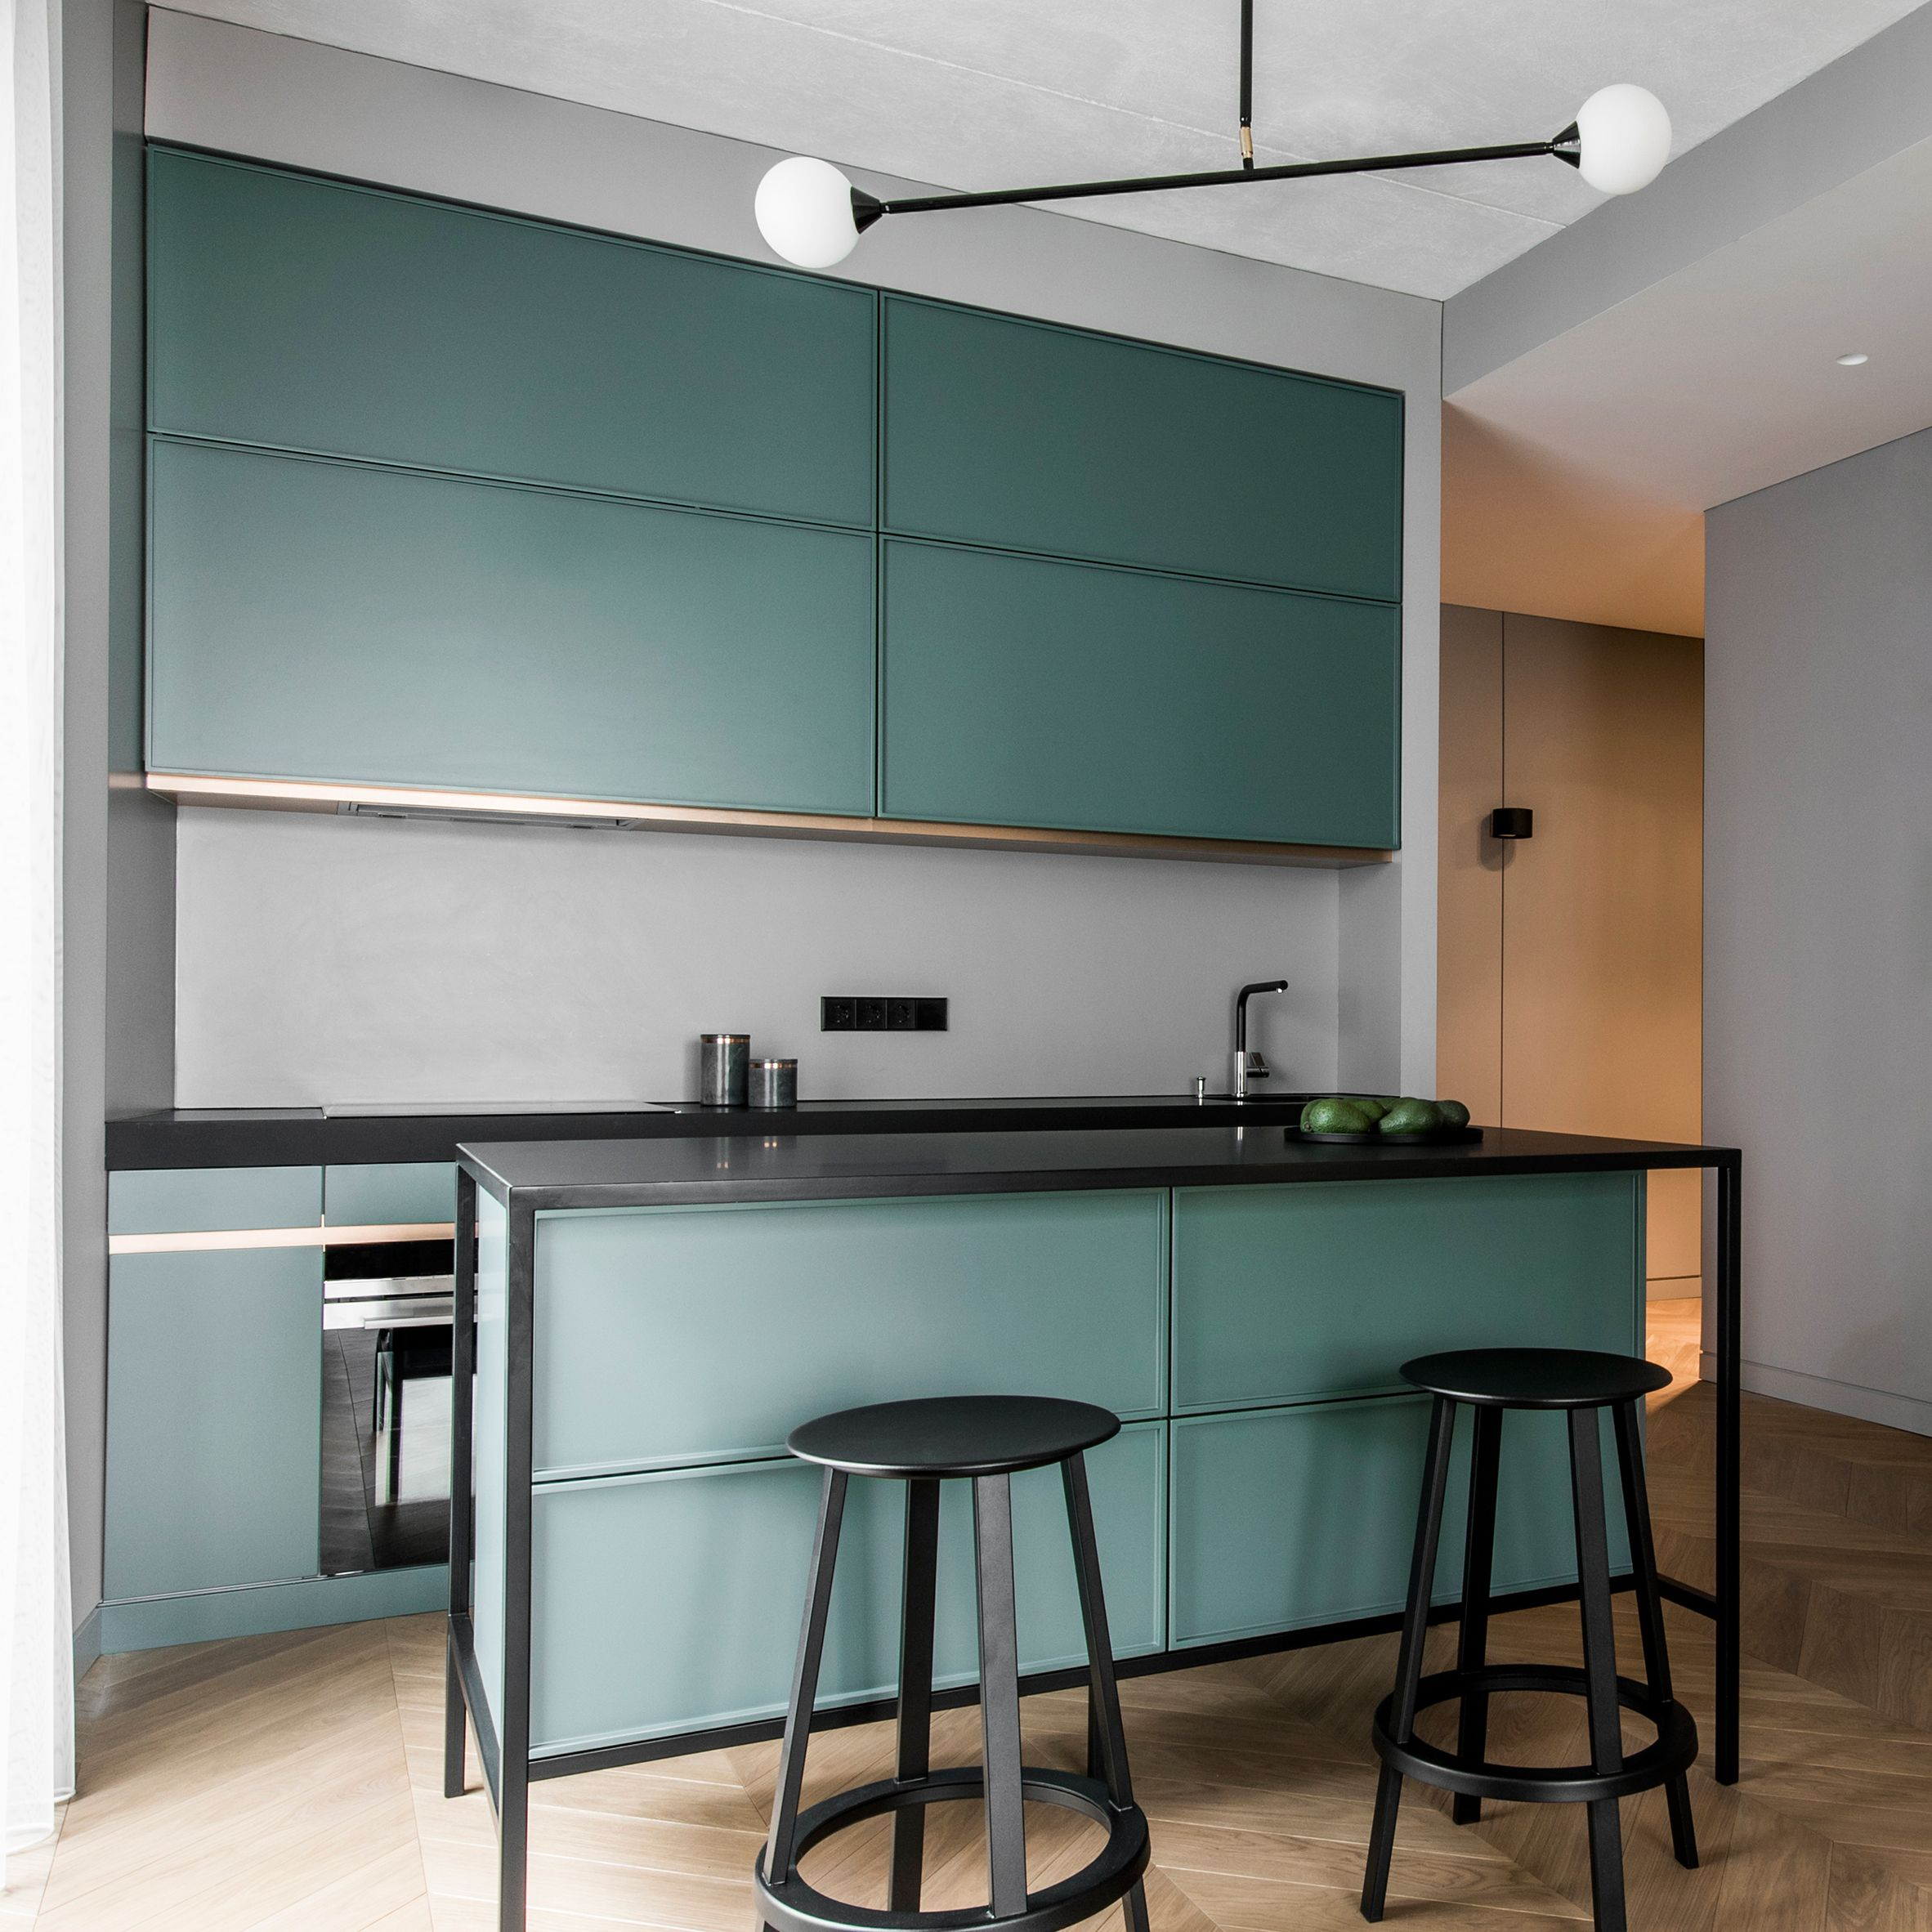 Basanaviciaus Apartment Akta Colour Blocking Pinterest Dezeen Col Kitchen Decor Apartment Kitchen Design Trends Interior Design Kitchen